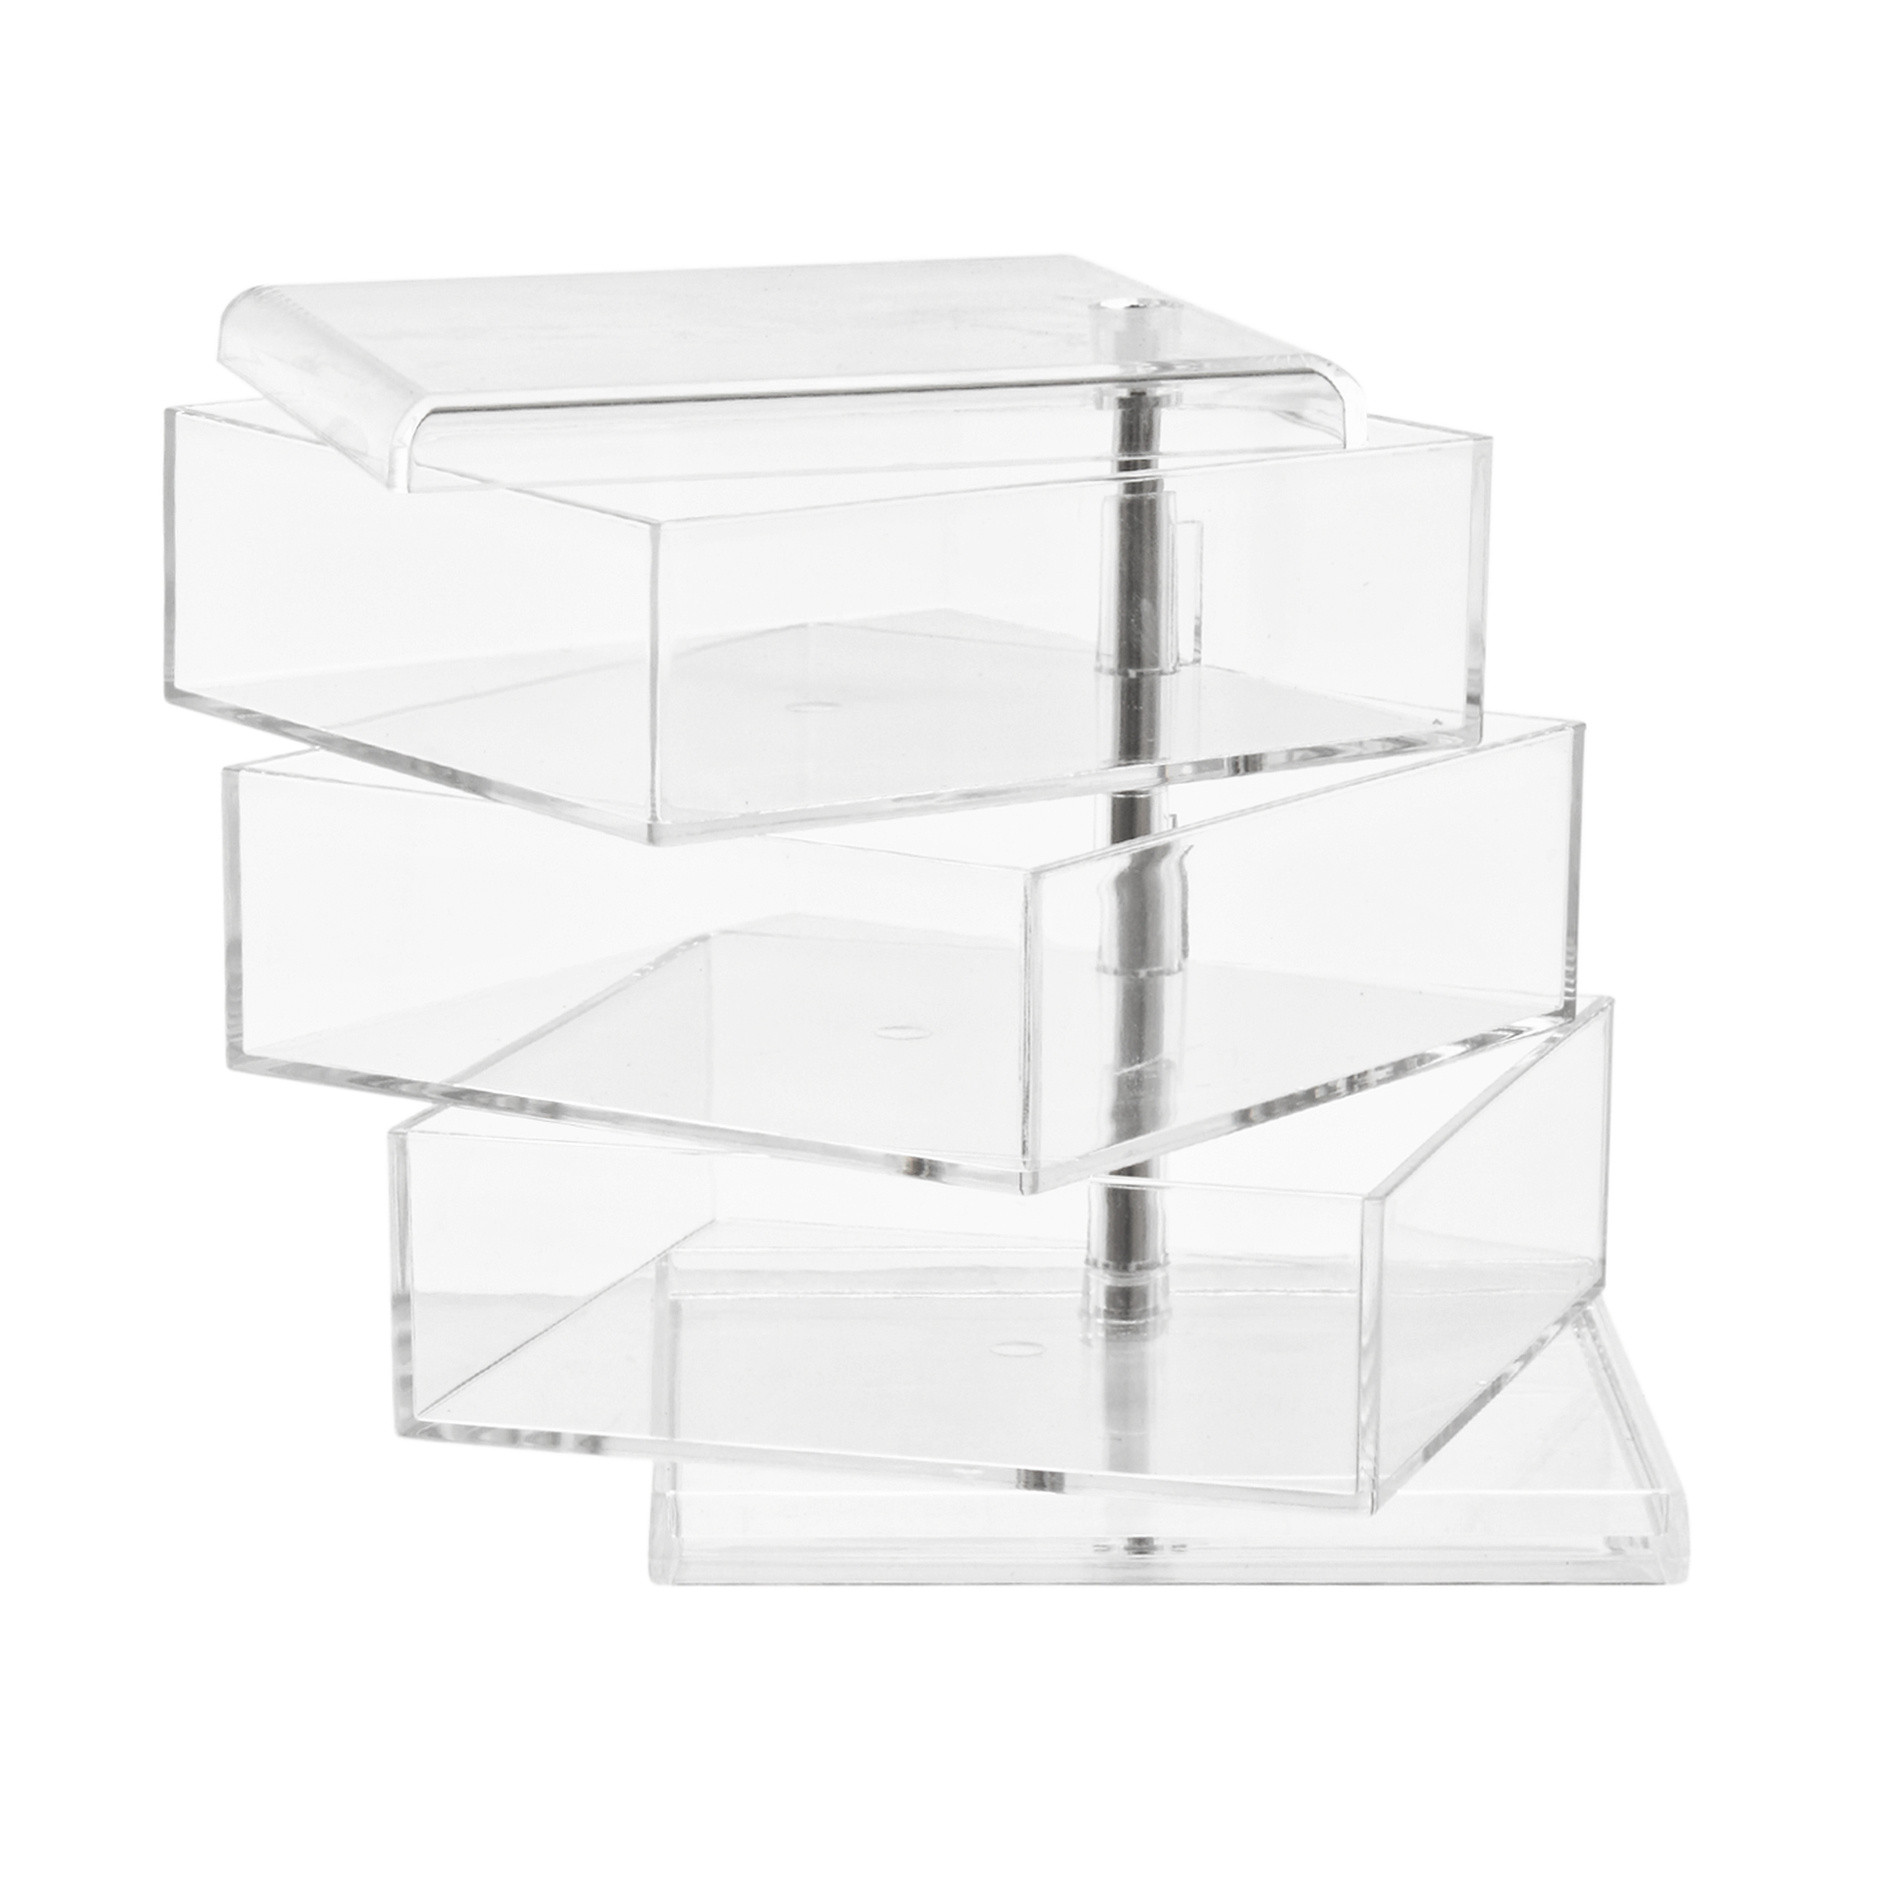 Storage 3 ripiani in plastica, Trasparente, large image number 1